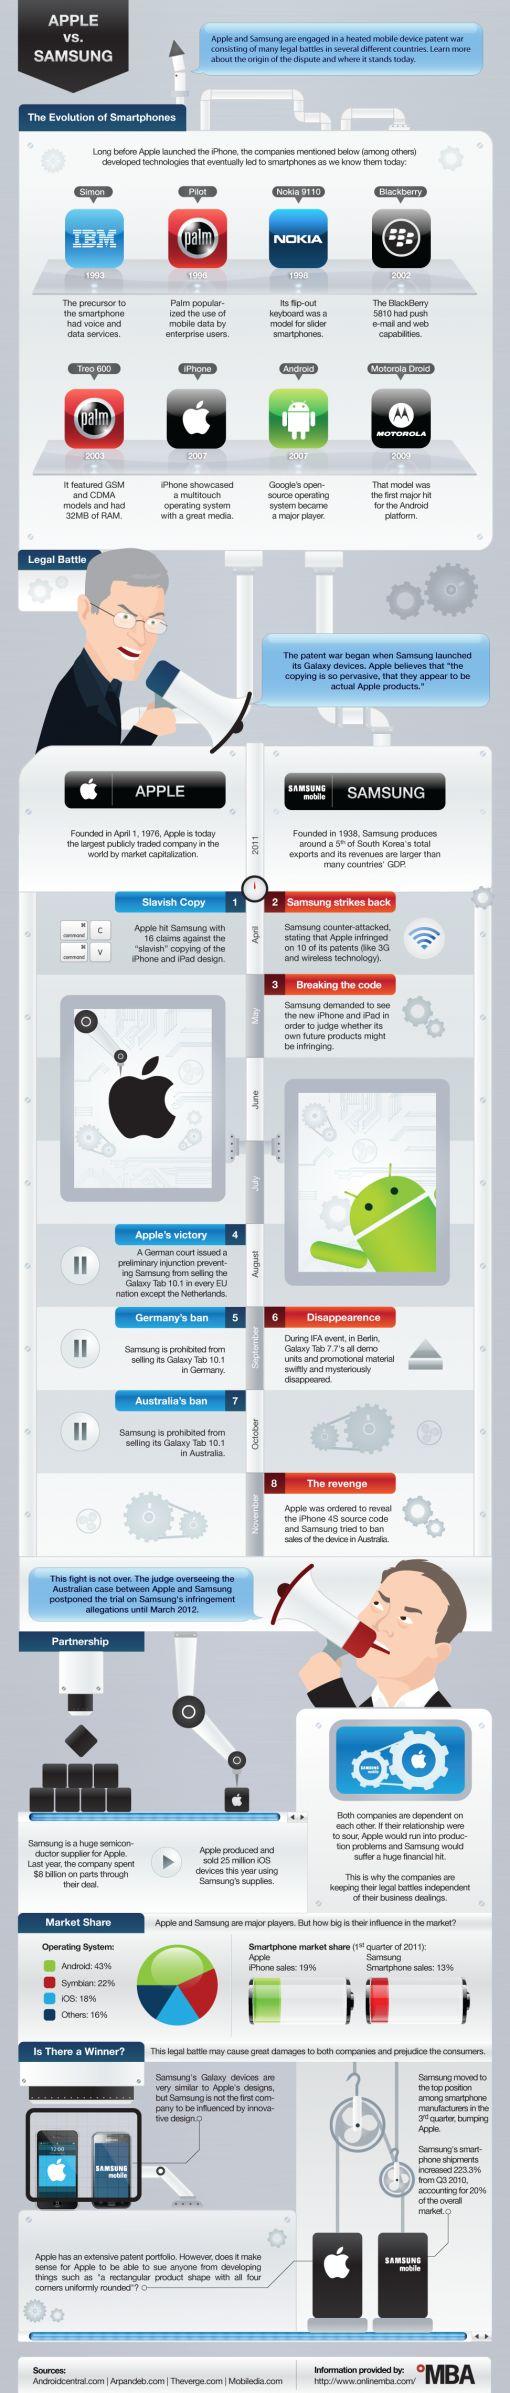 apple-samsung-patents